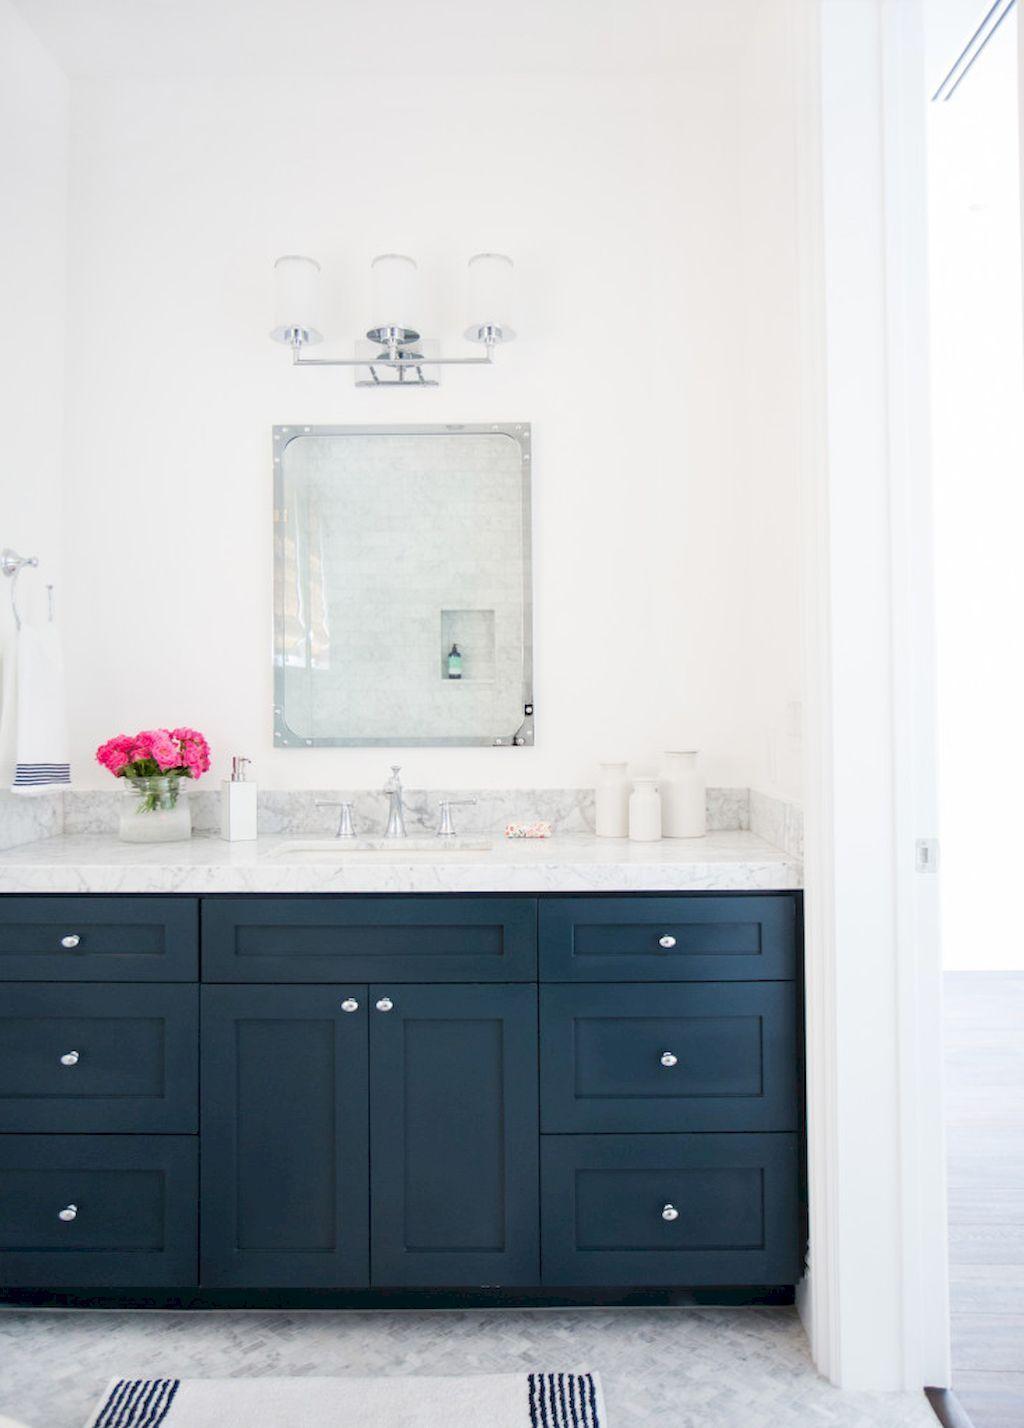 48 Top Bathroom Cabinet Ideas & Organization Tips | Bathroom ...